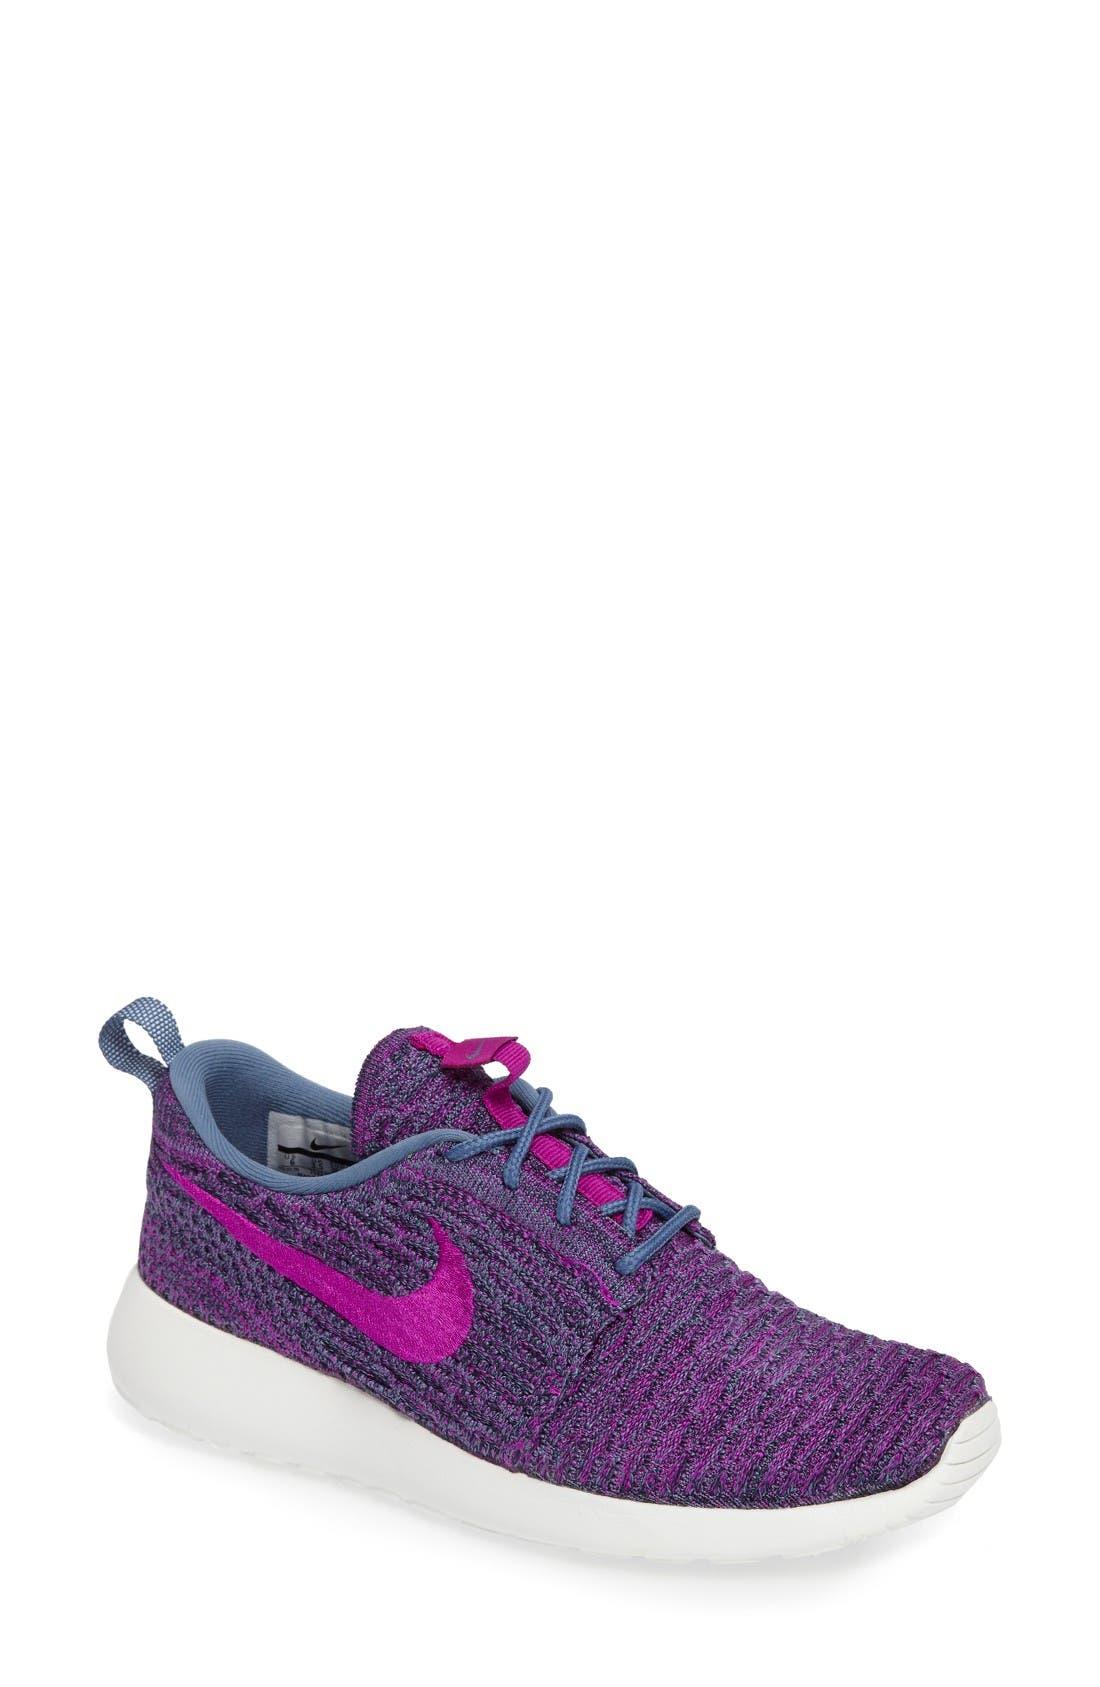 FlyKnit Roshe Run Sneaker,                         Main,                         color, Ocean Fog/ Vivid Purple